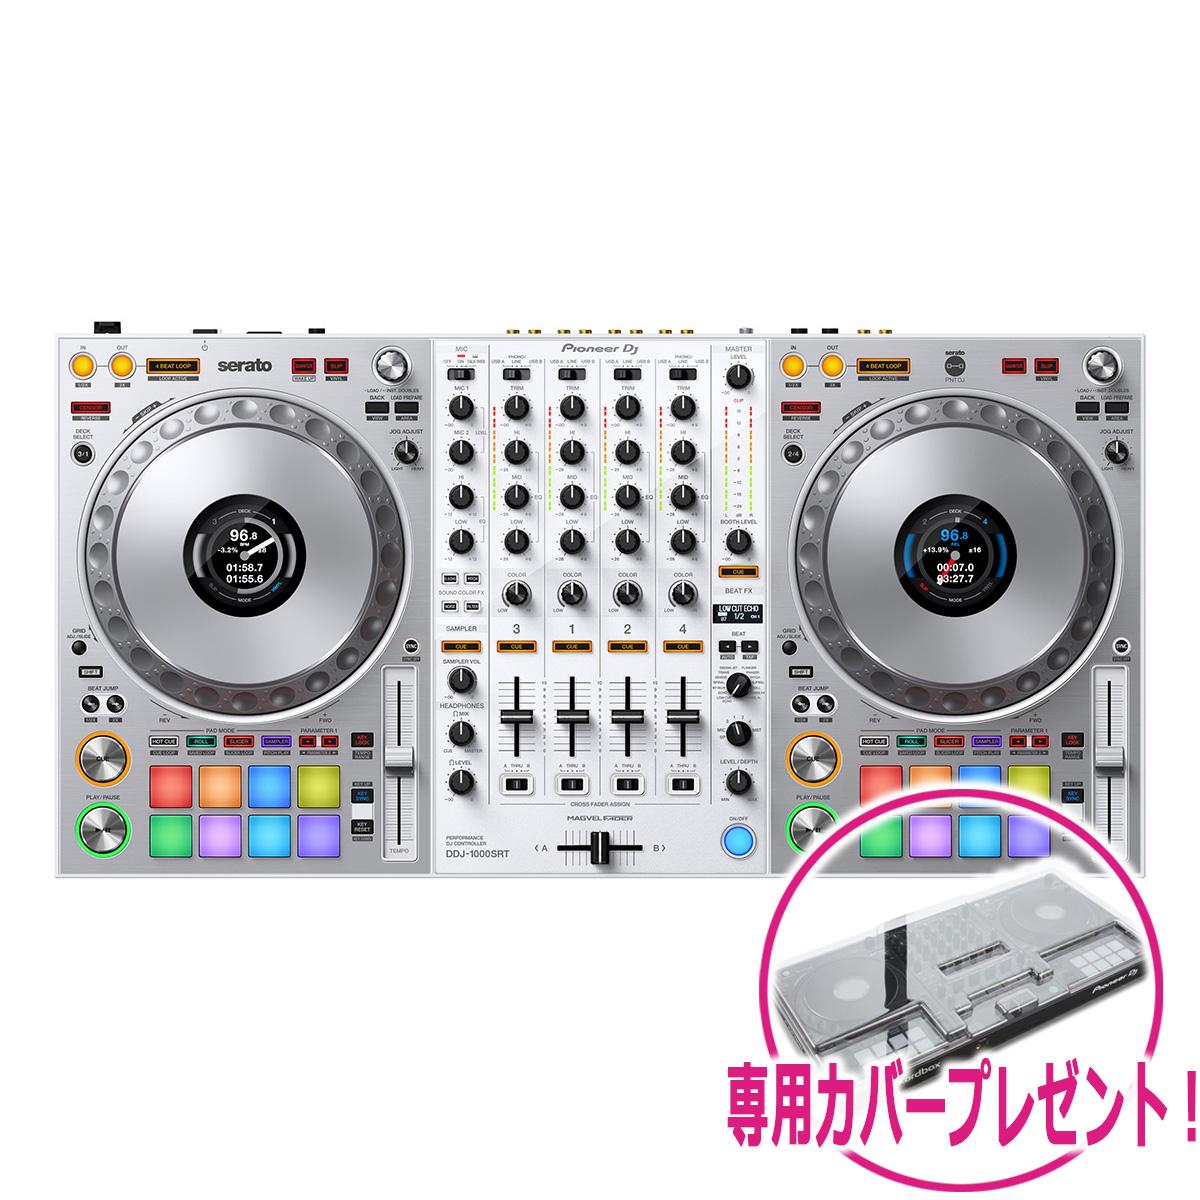 【Serato DJ Suite 無償同梱】 Pioneer DJ DDJ-1000SRT-W Serato DJ Pro 専用4chDJコントローラー 【パイオニア】【数量限定ホワイトカラー】